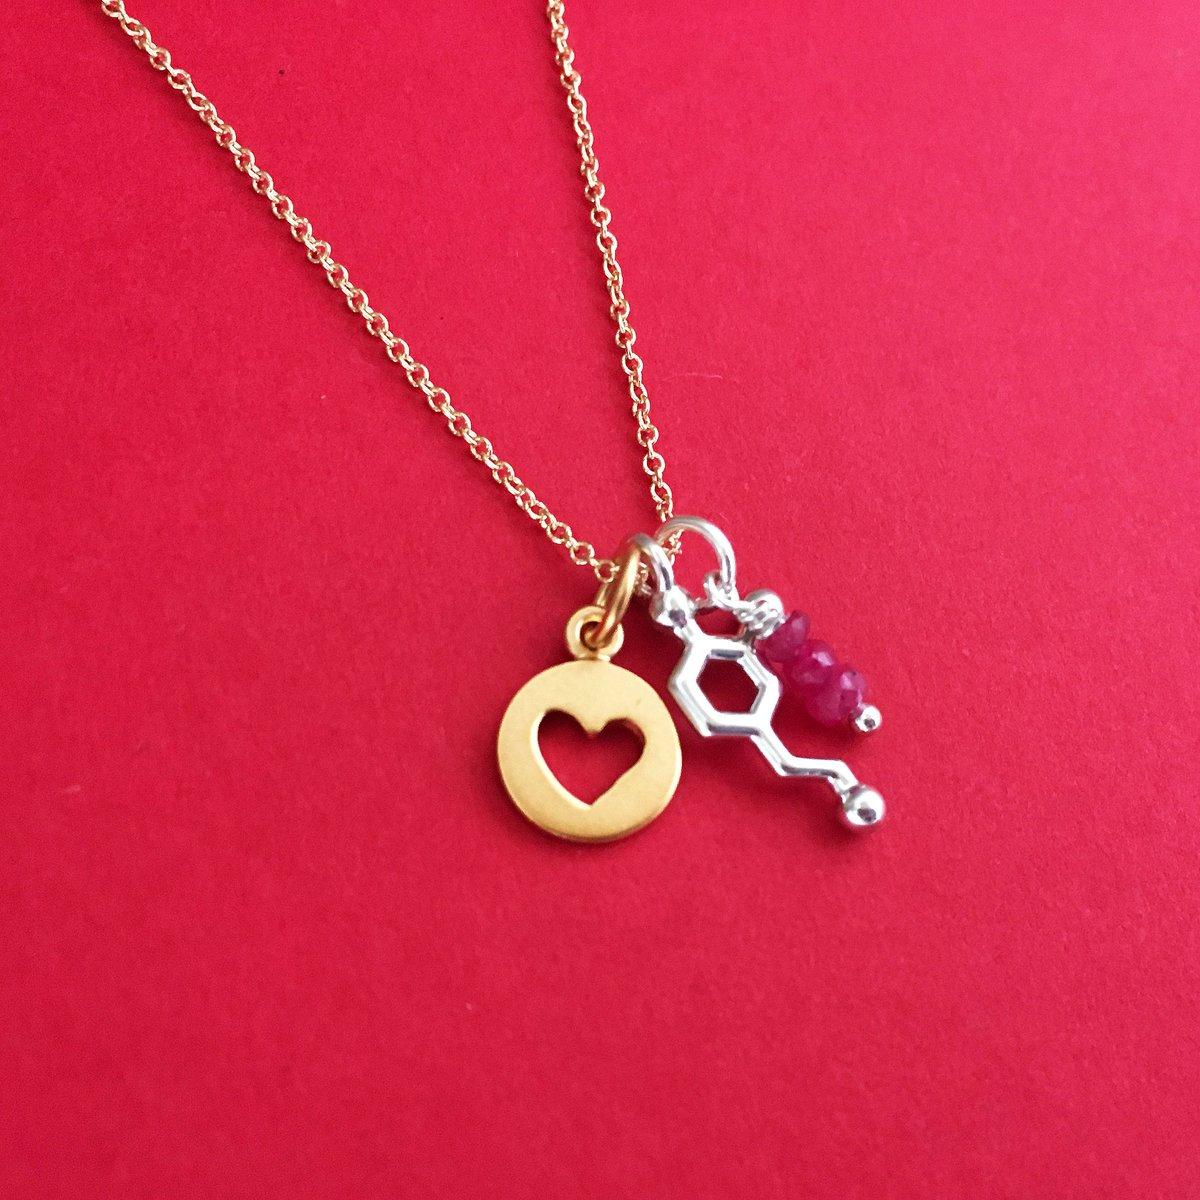 Tiny Dopamine Heart Ruby Necklace Made With Molecules